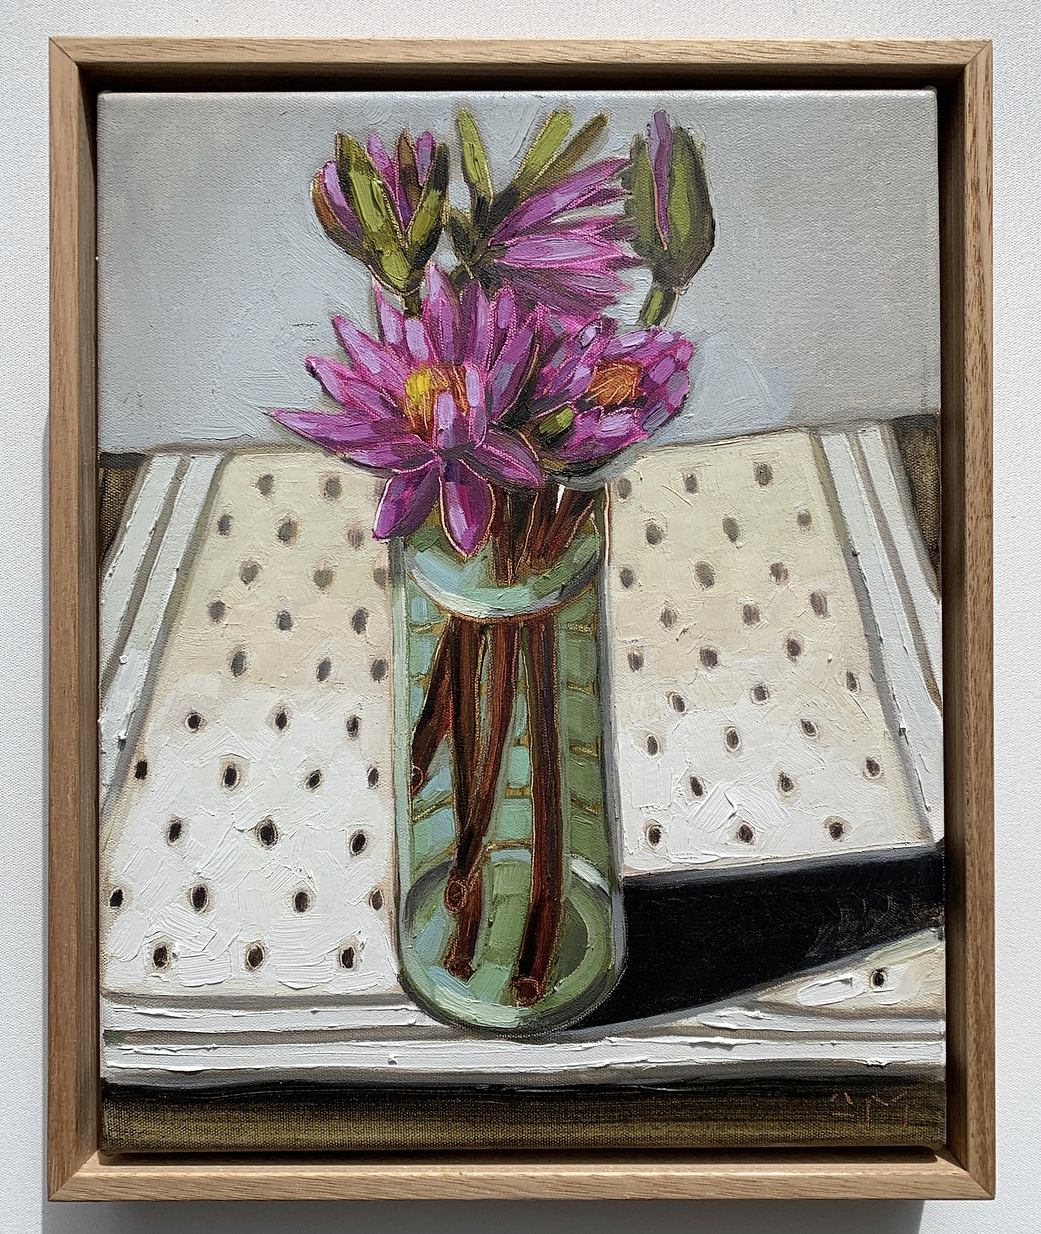 sam michelle 'lilies & turquoise vase' 3